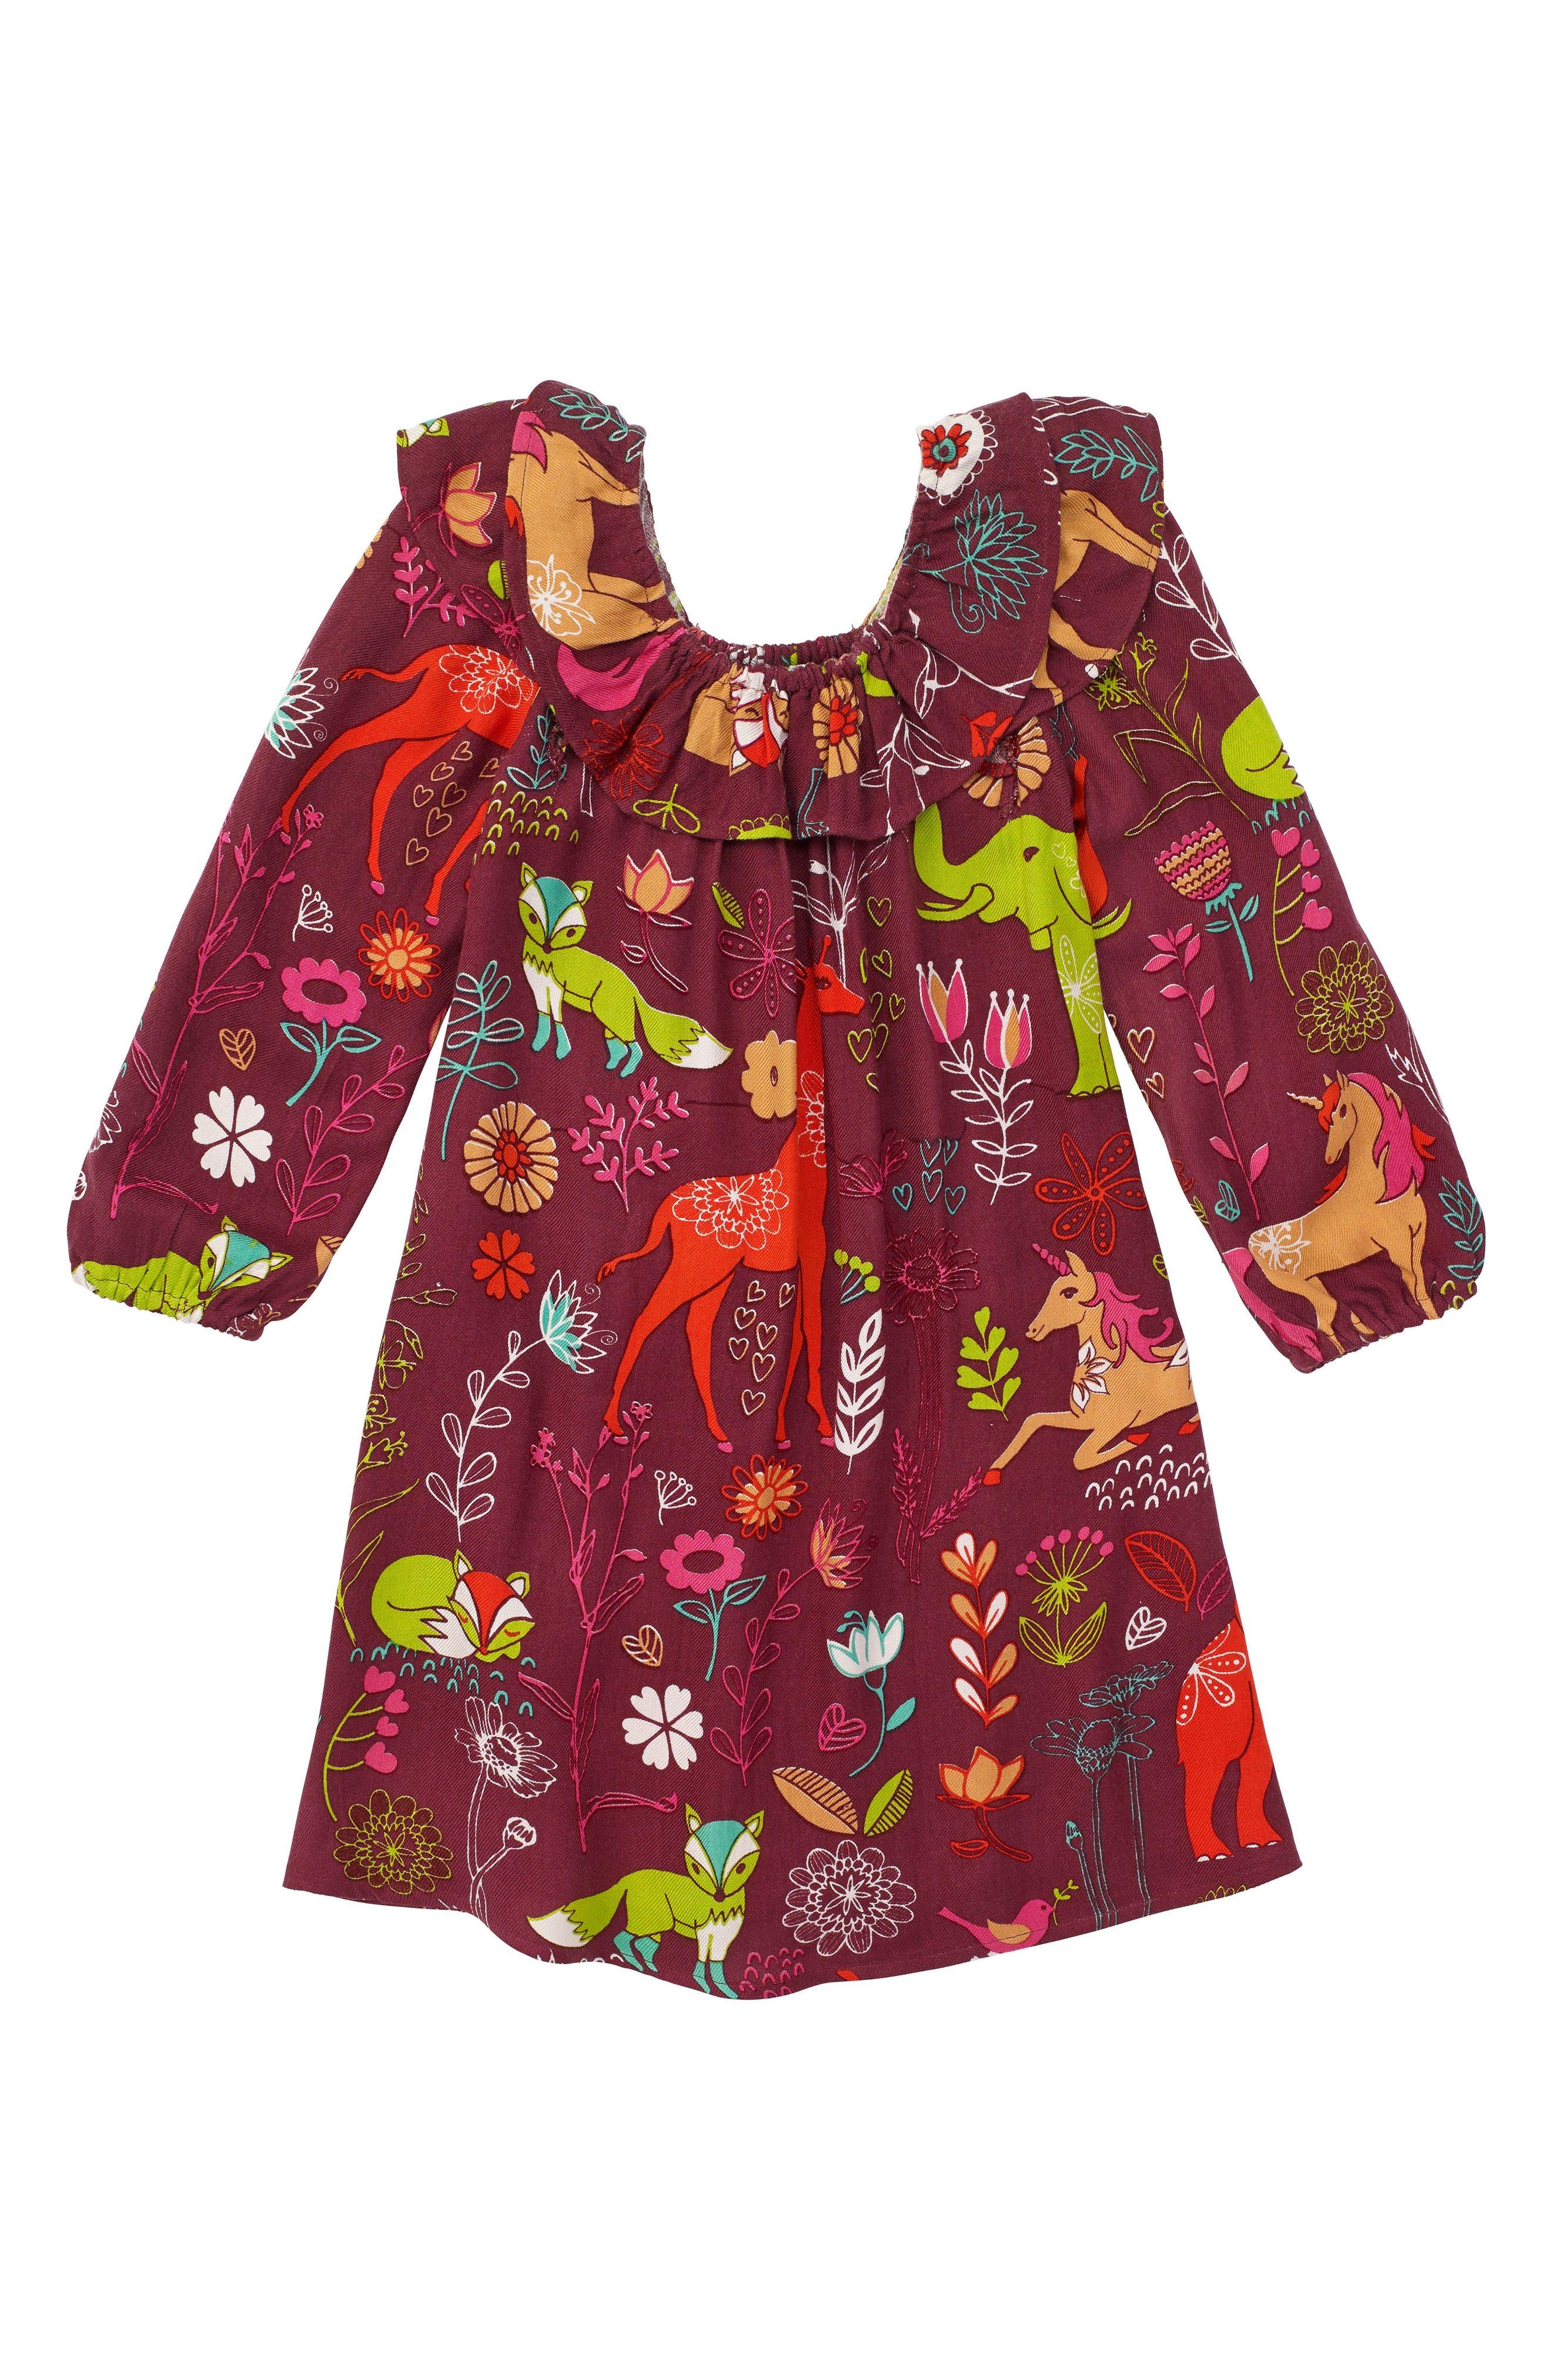 Main Image - Masalababy Magic Forest Print Dress (Toddler Girls, Little Girls & Big Girls)